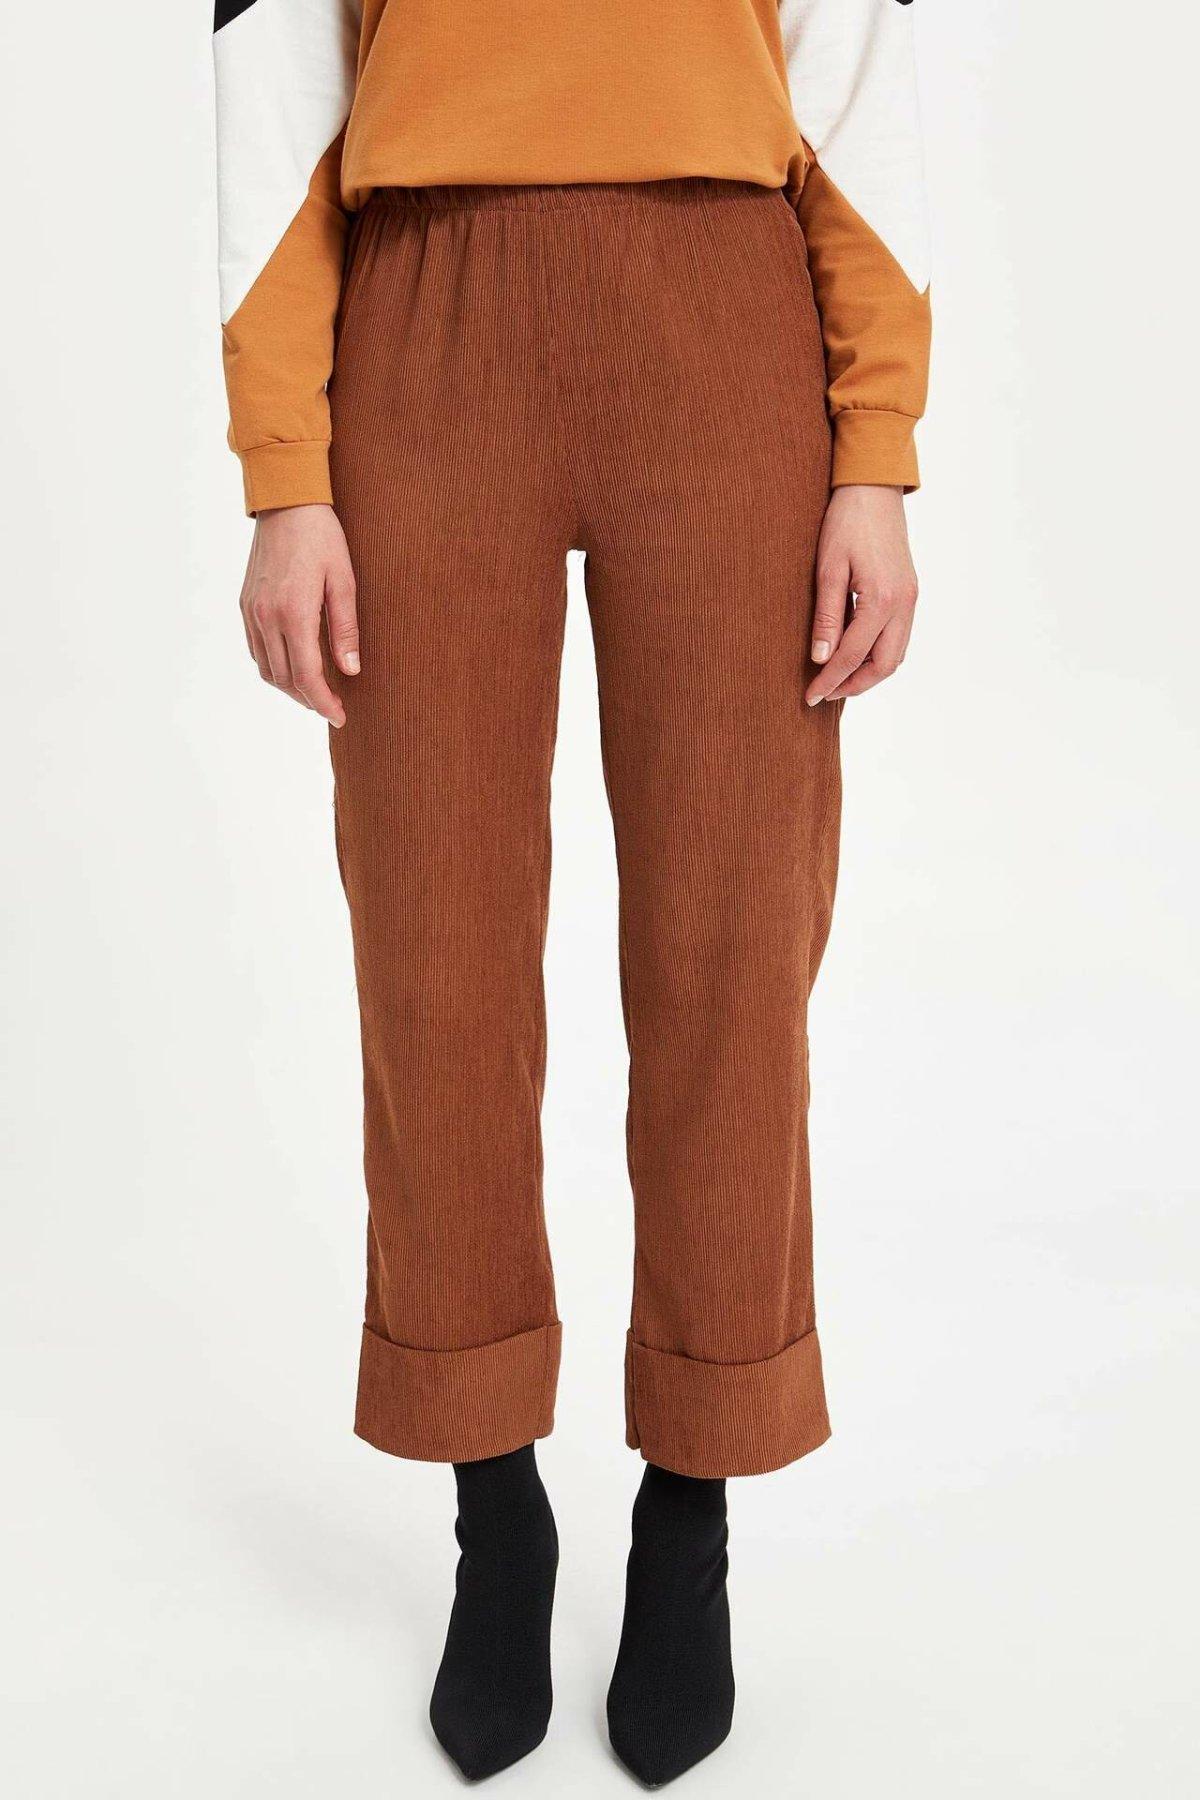 DeFacto Woman Trousers Women Solid Color Loose Pants Red Camel Casual Long Pants Women Bottoms-M8636AZ19WN